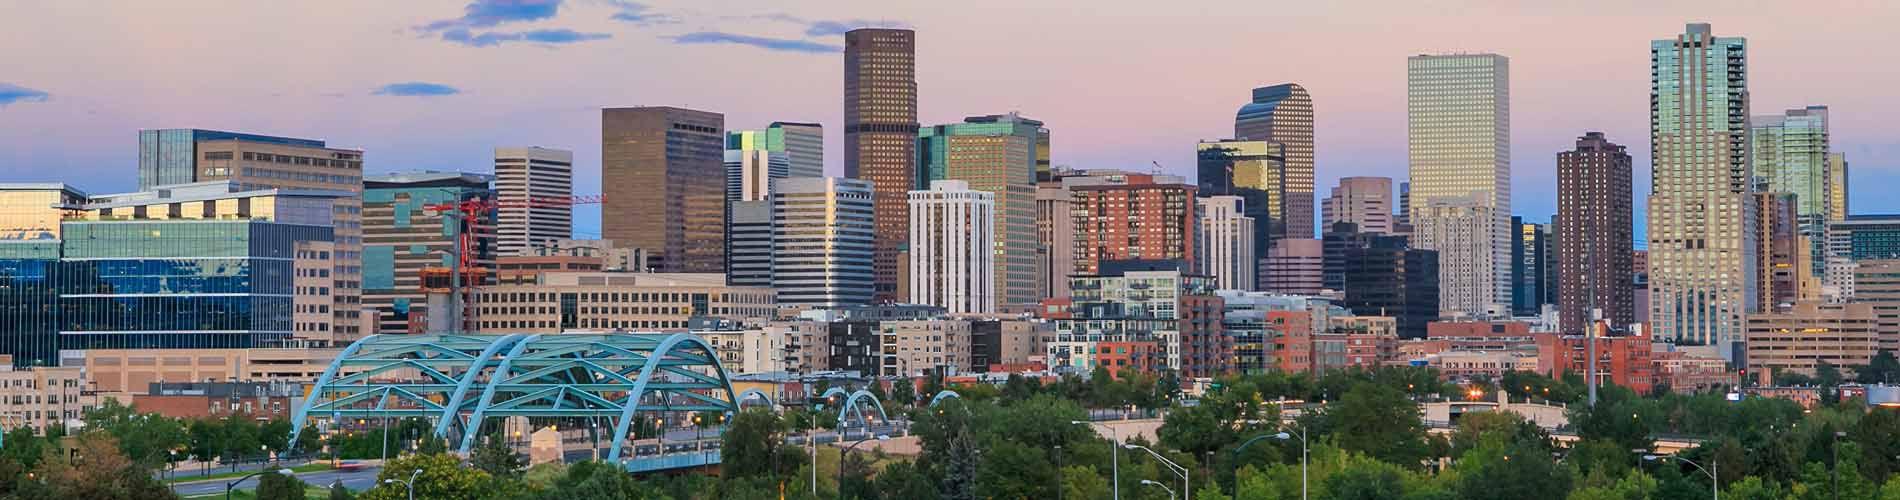 Denver Metals Service Center - Colorado | McNICHOLS®